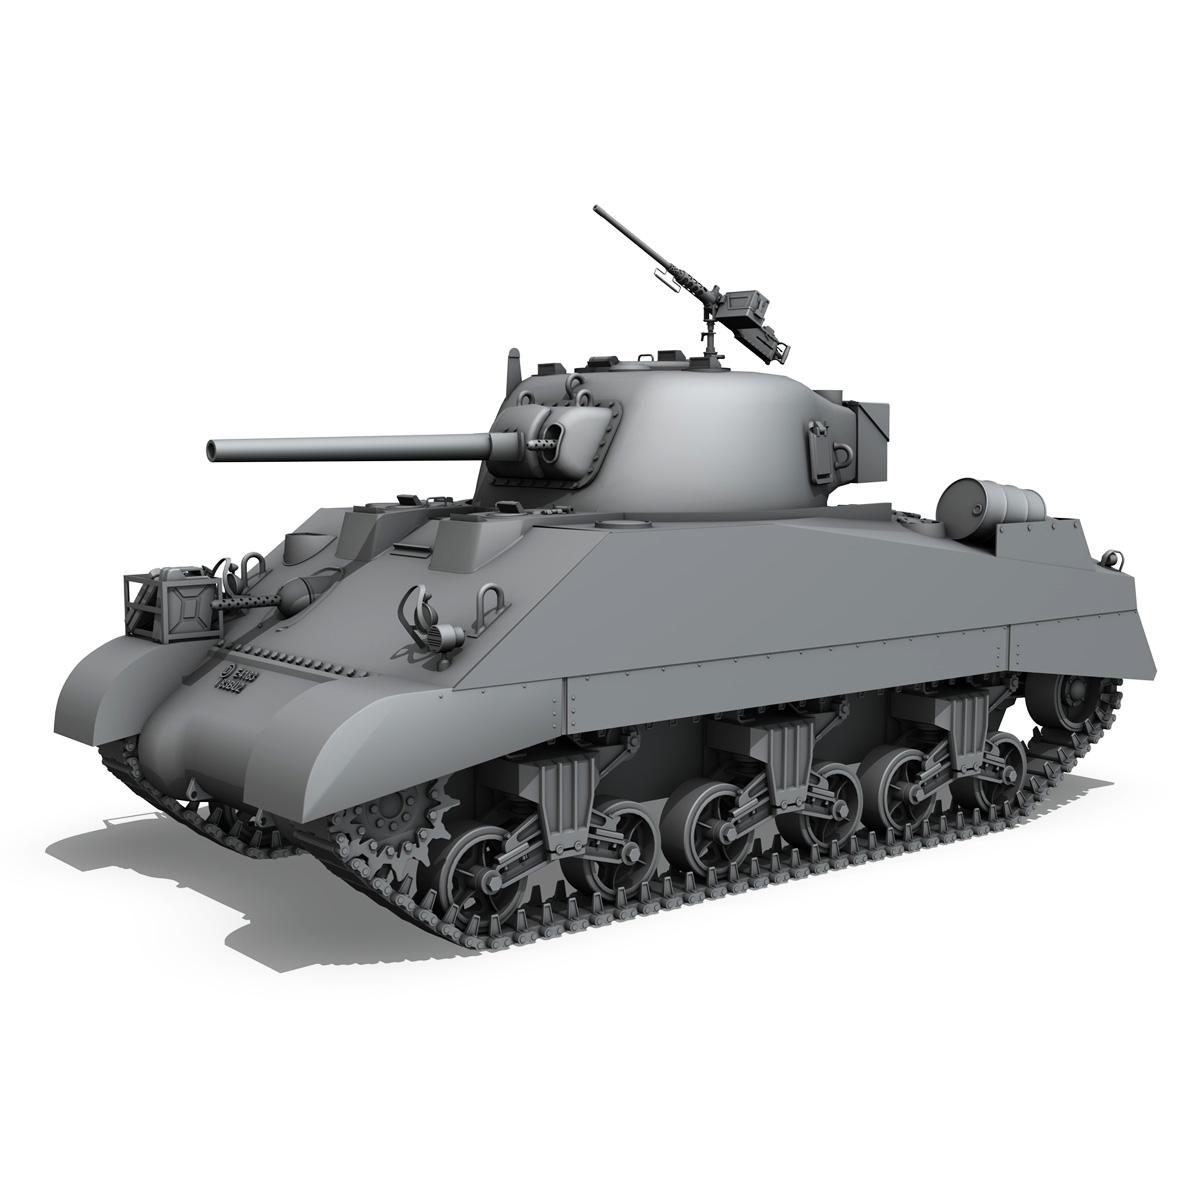 m4 sherman mk iii - britu armija 3d modelis 3ds fbx c4d lwo obj 201965